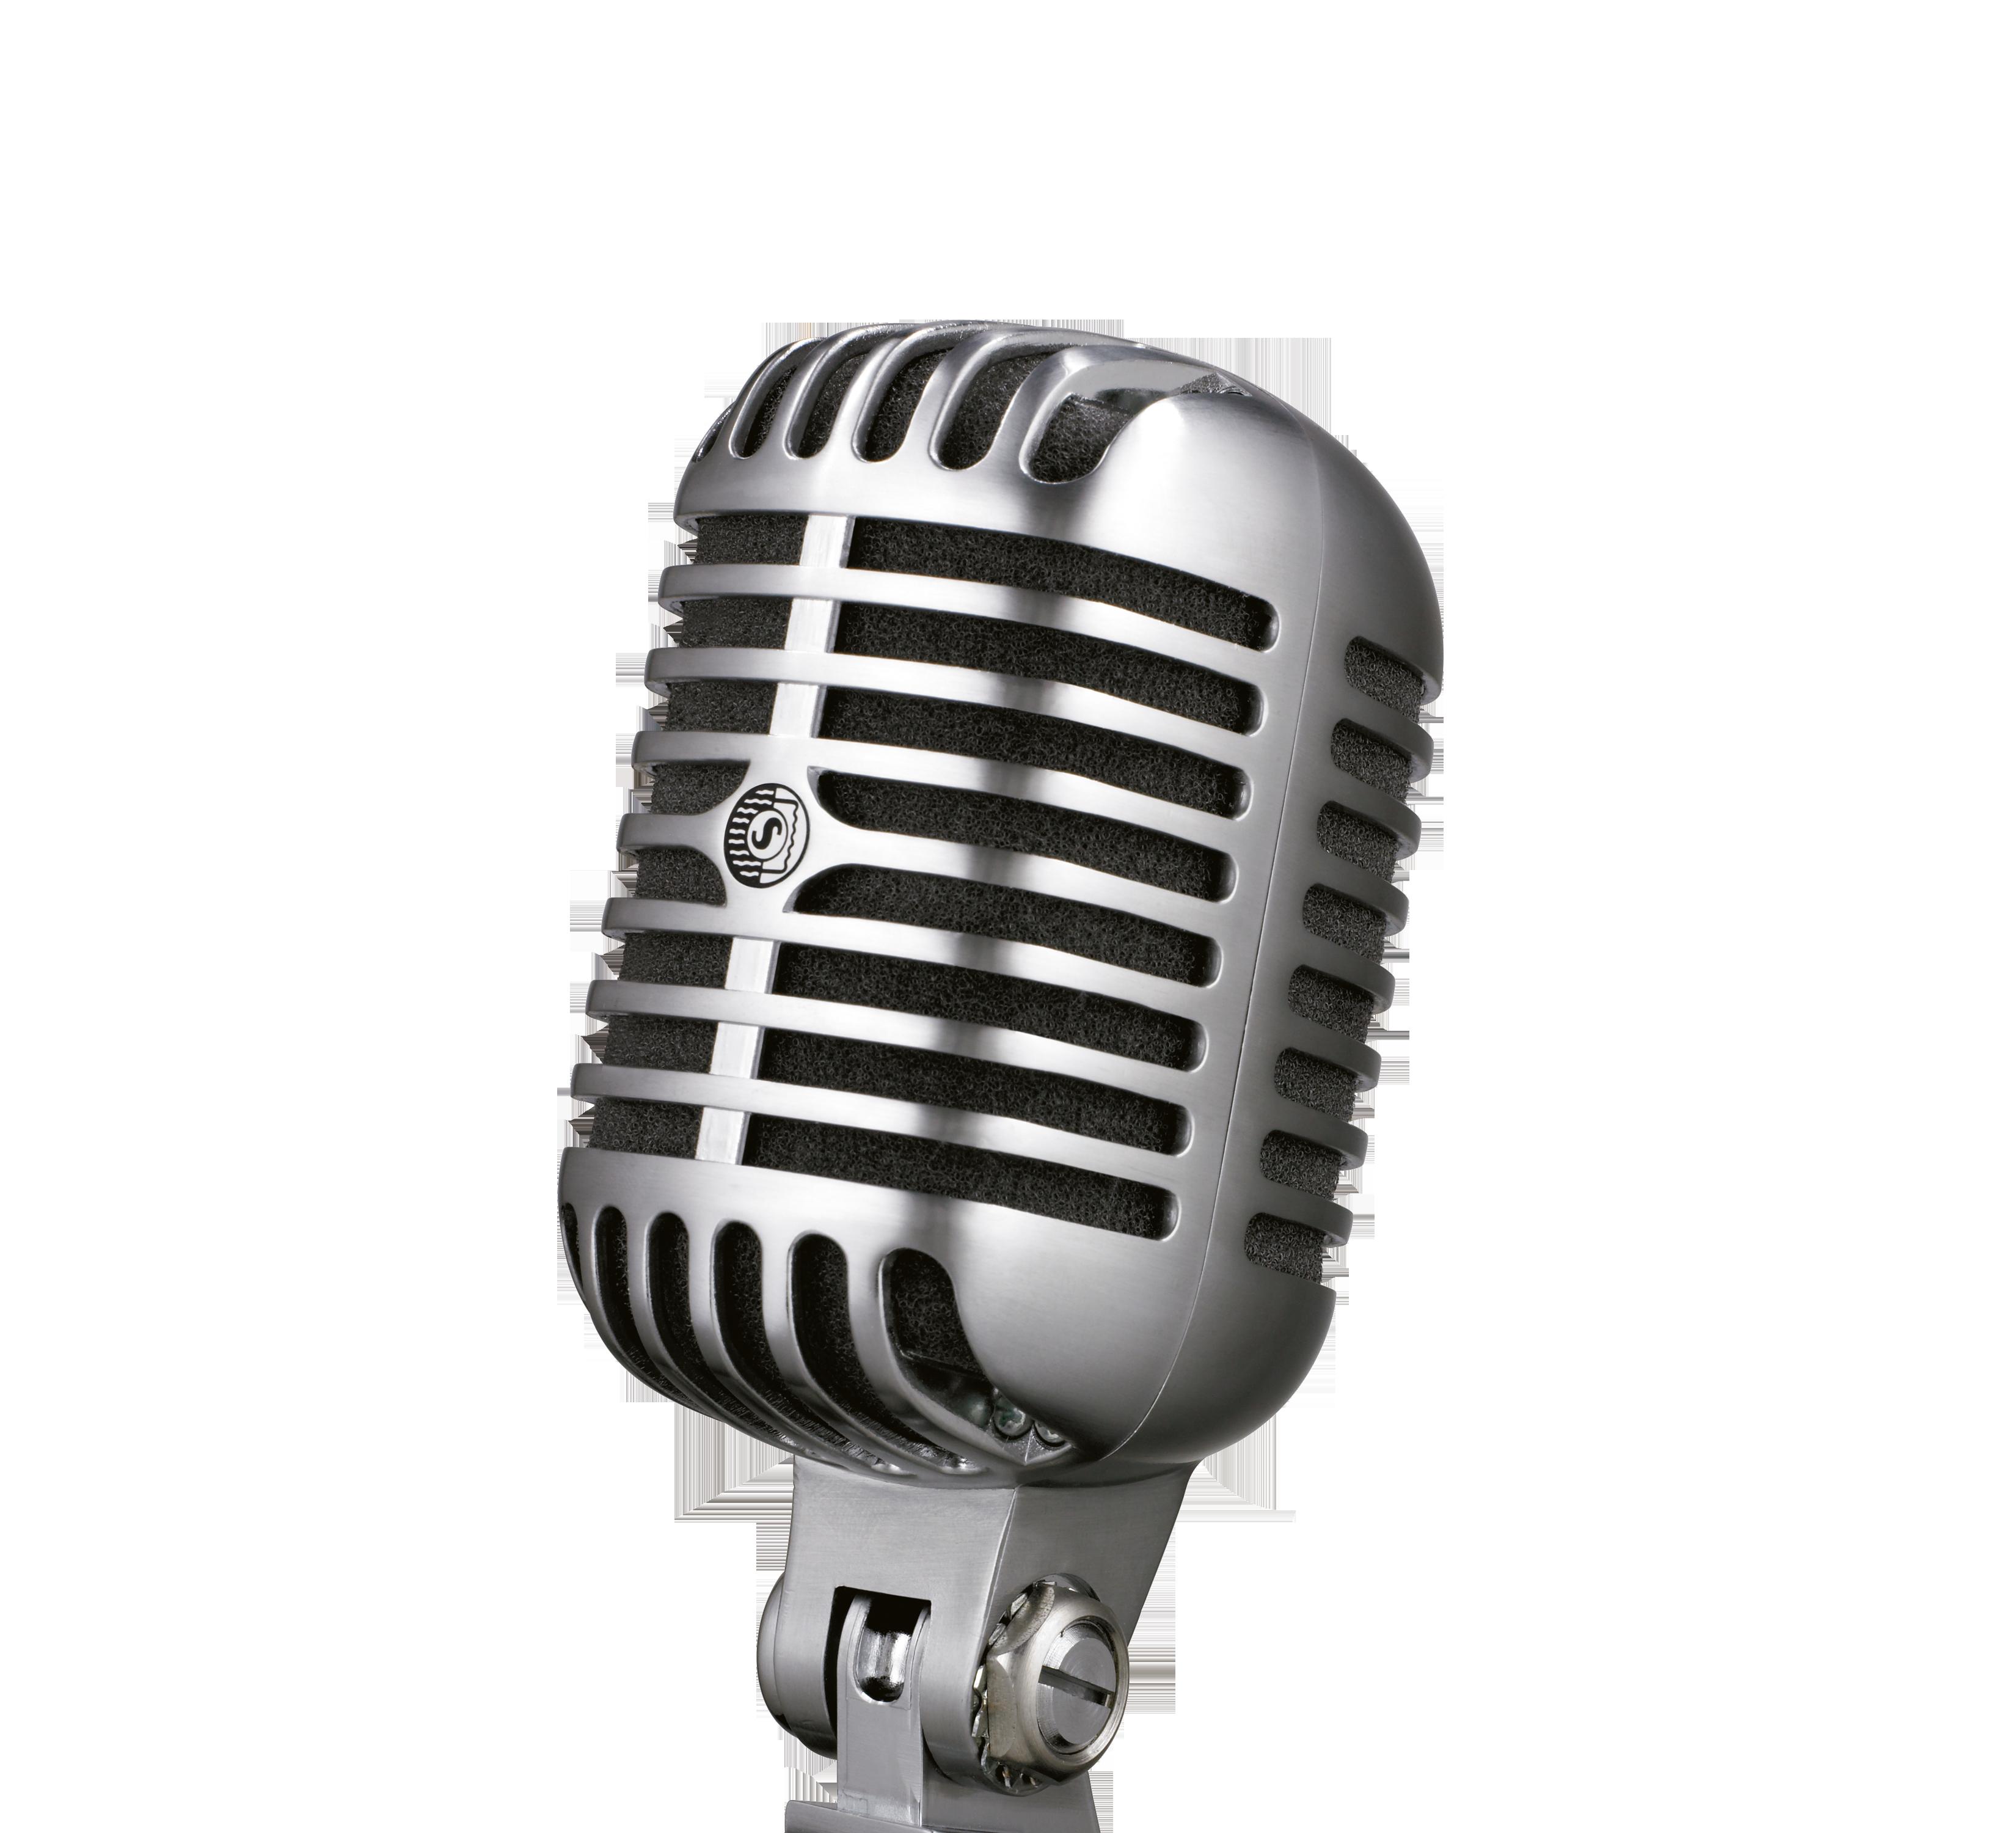 Microphone HD PNG - 92644